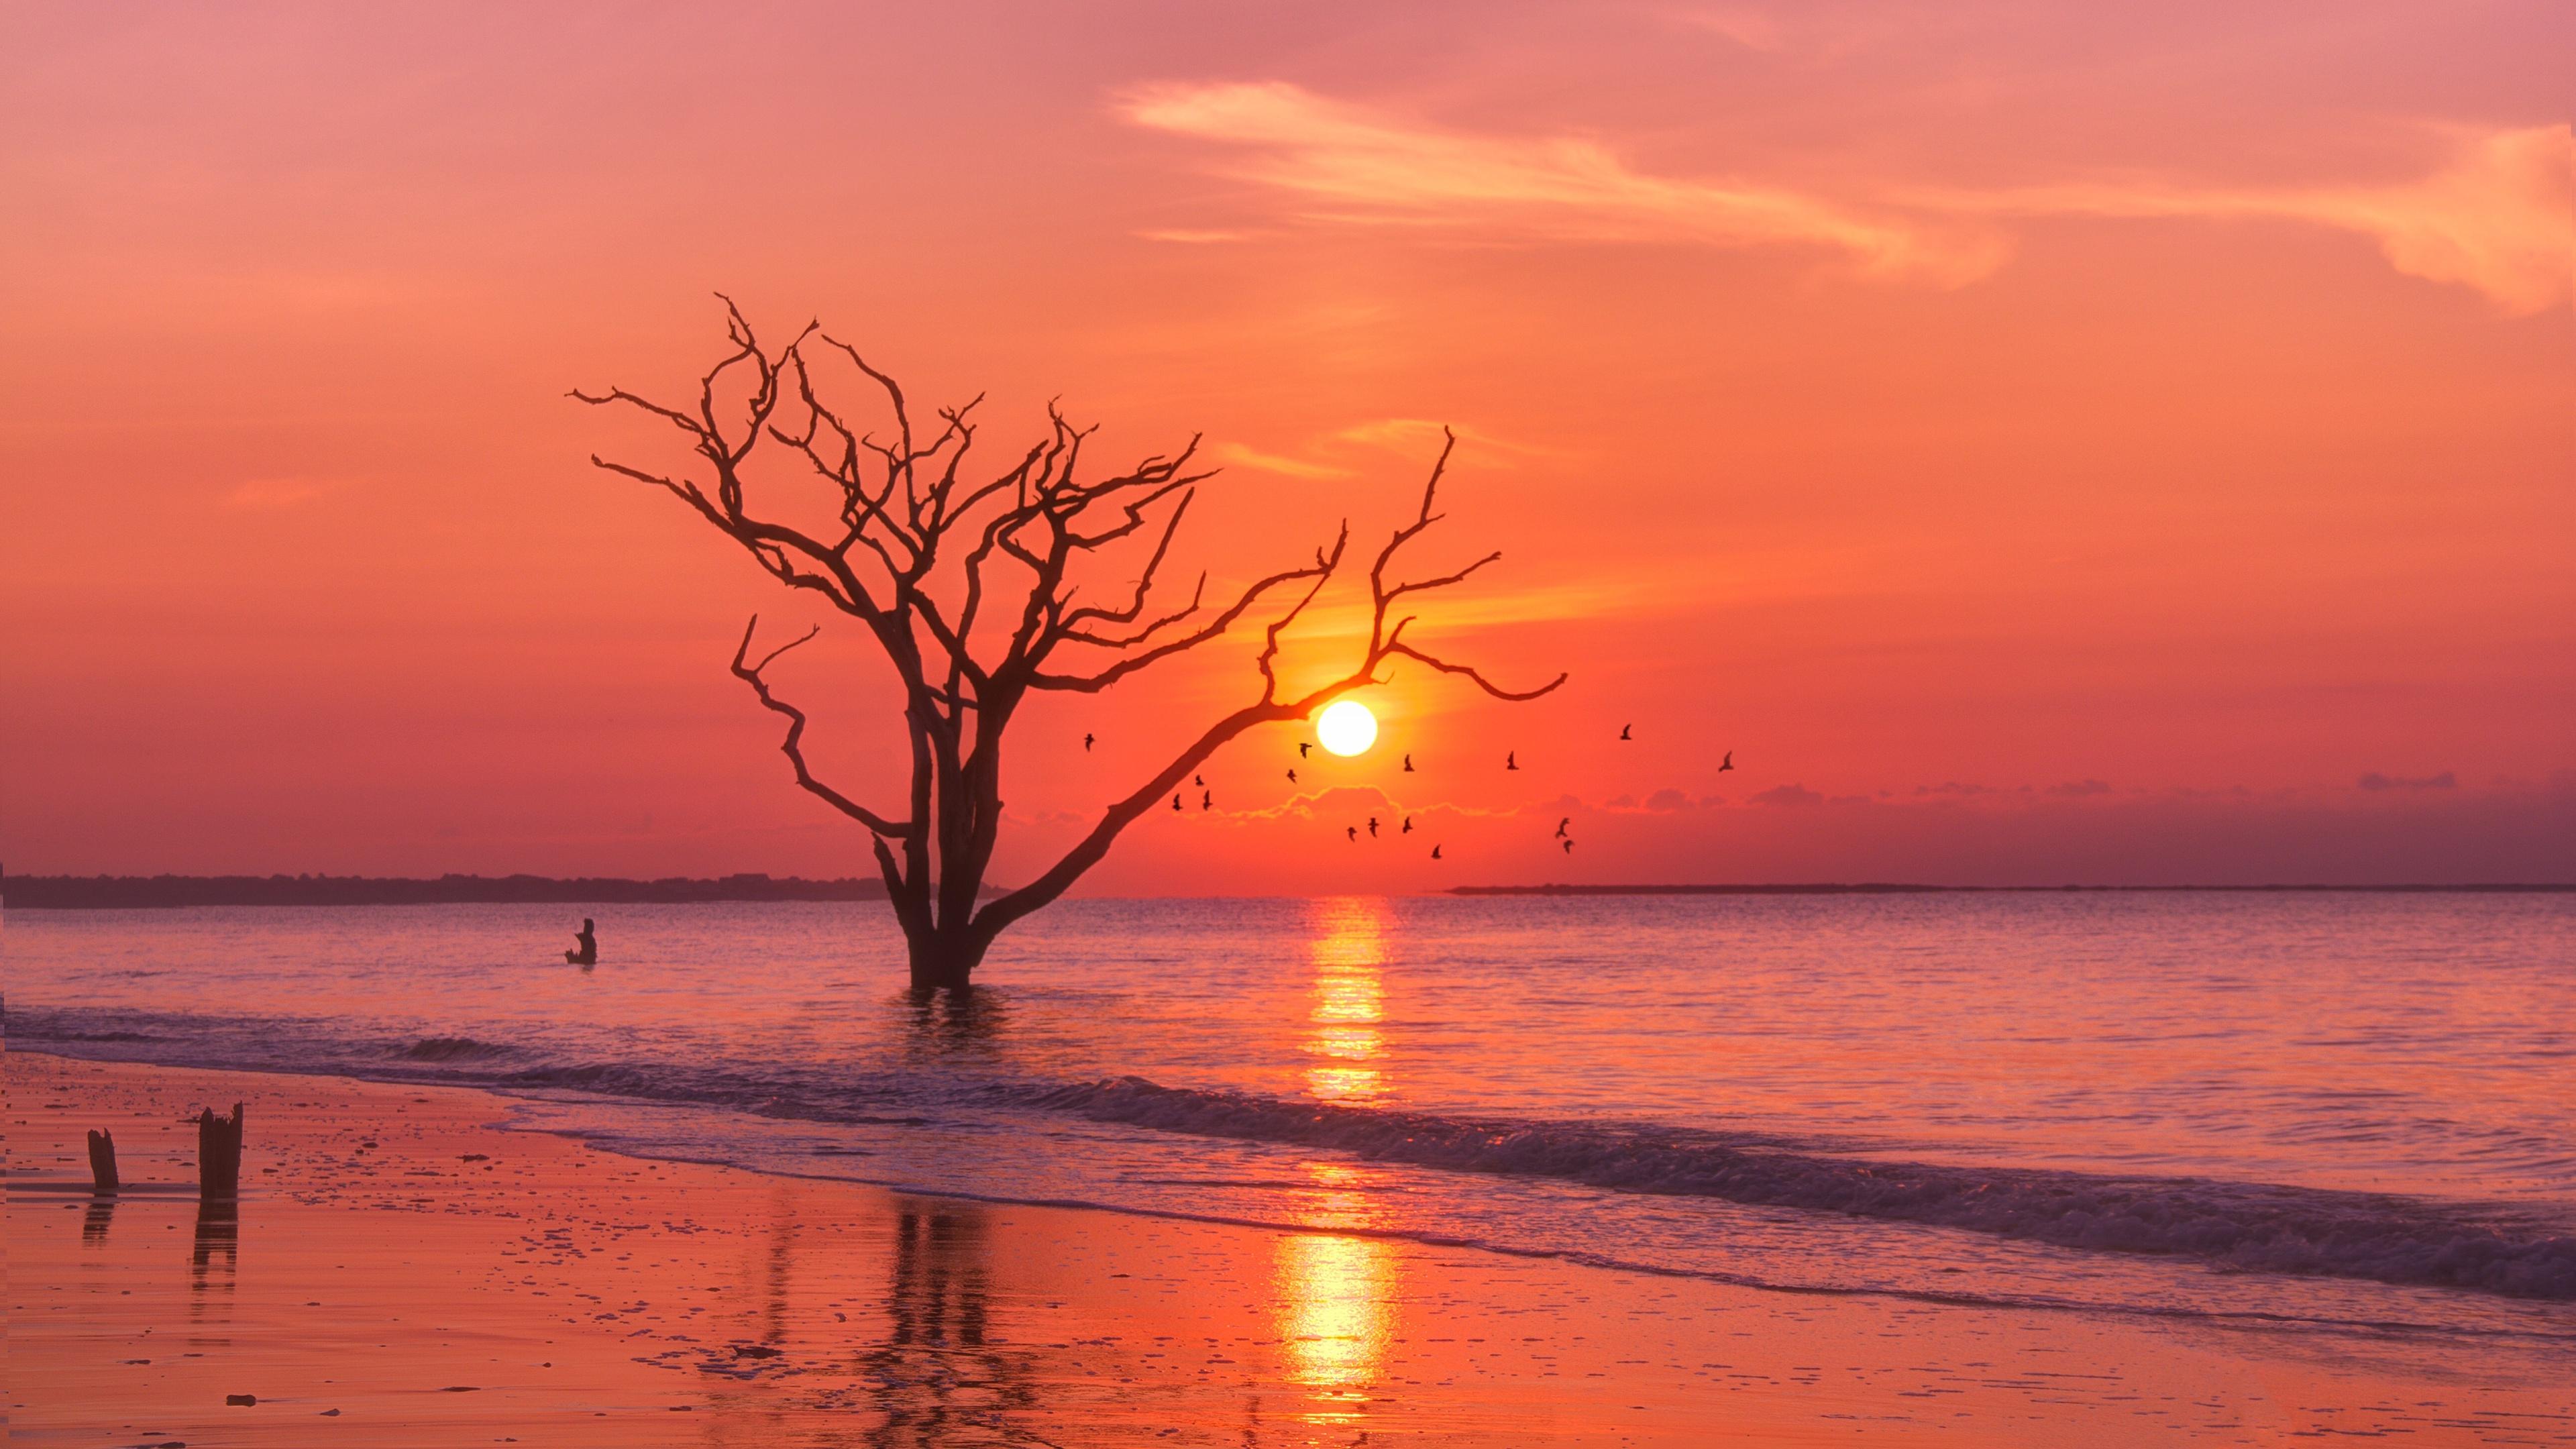 General 3840x2160 nature sunlight water sky trees sunset orange sky dead trees beach orange